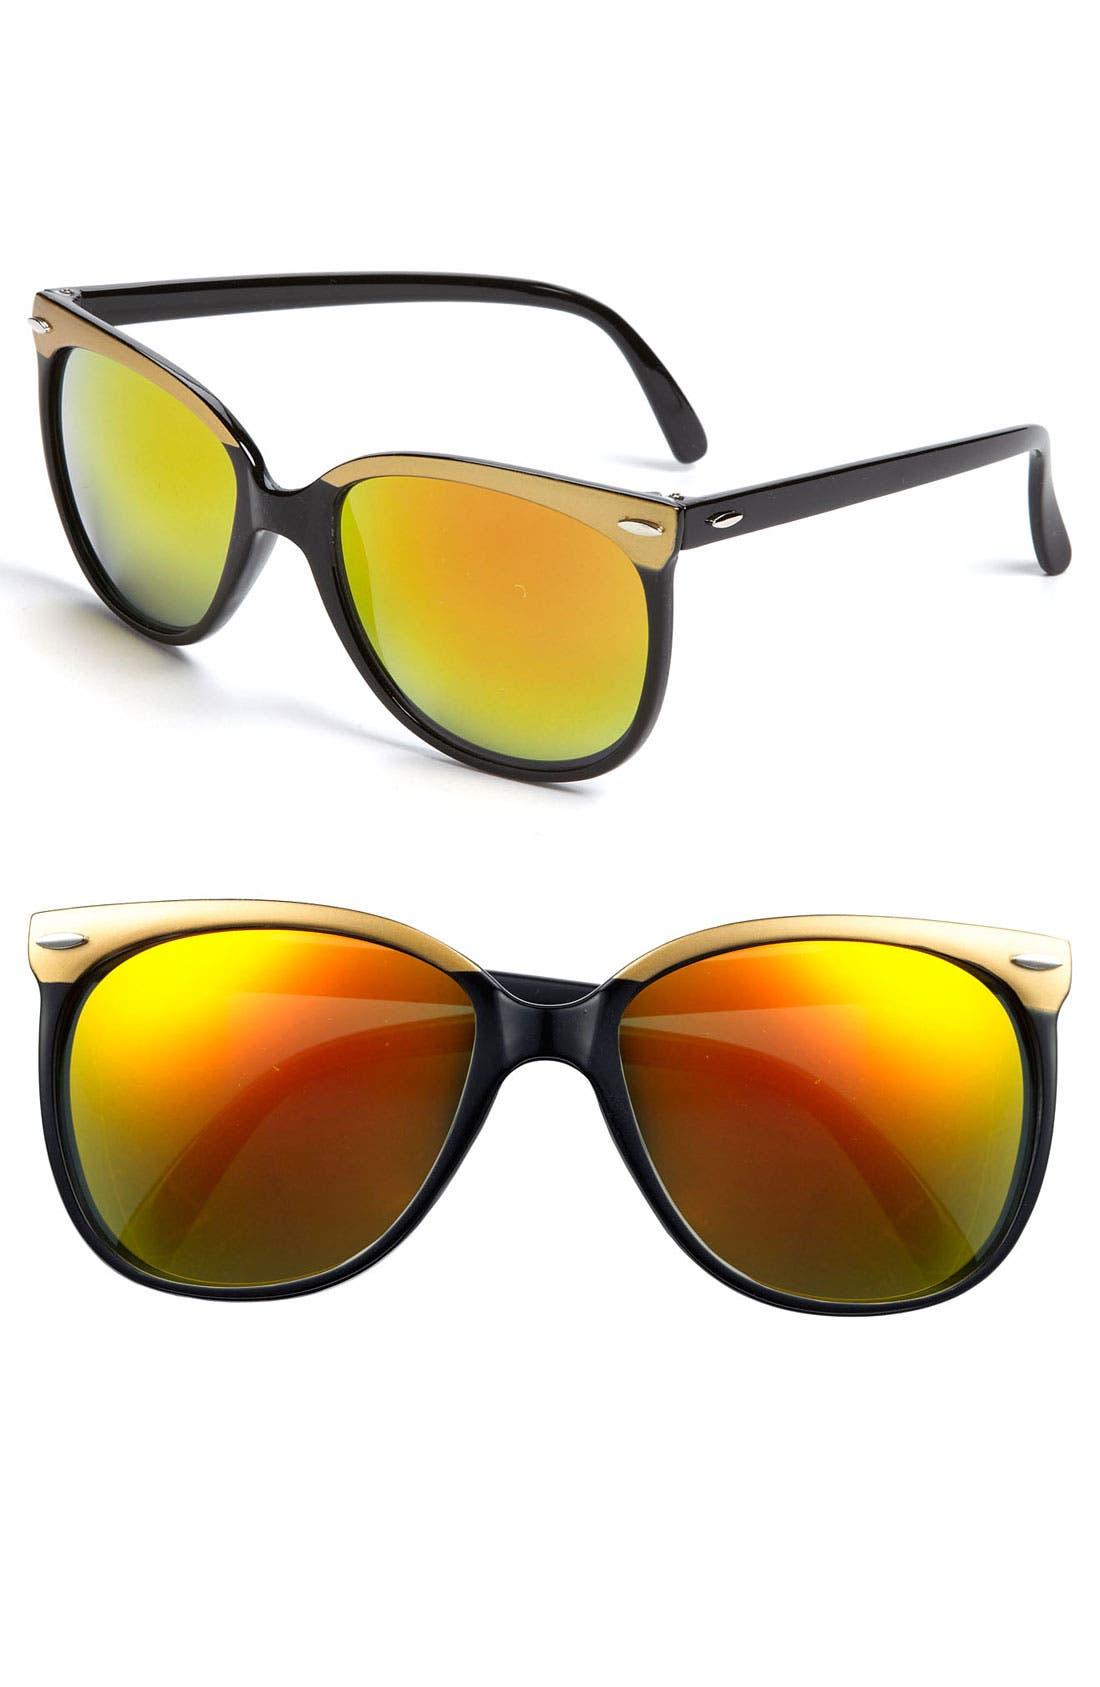 Alternate Image 1 Selected - BP. Mirrored Retro Sunglasses